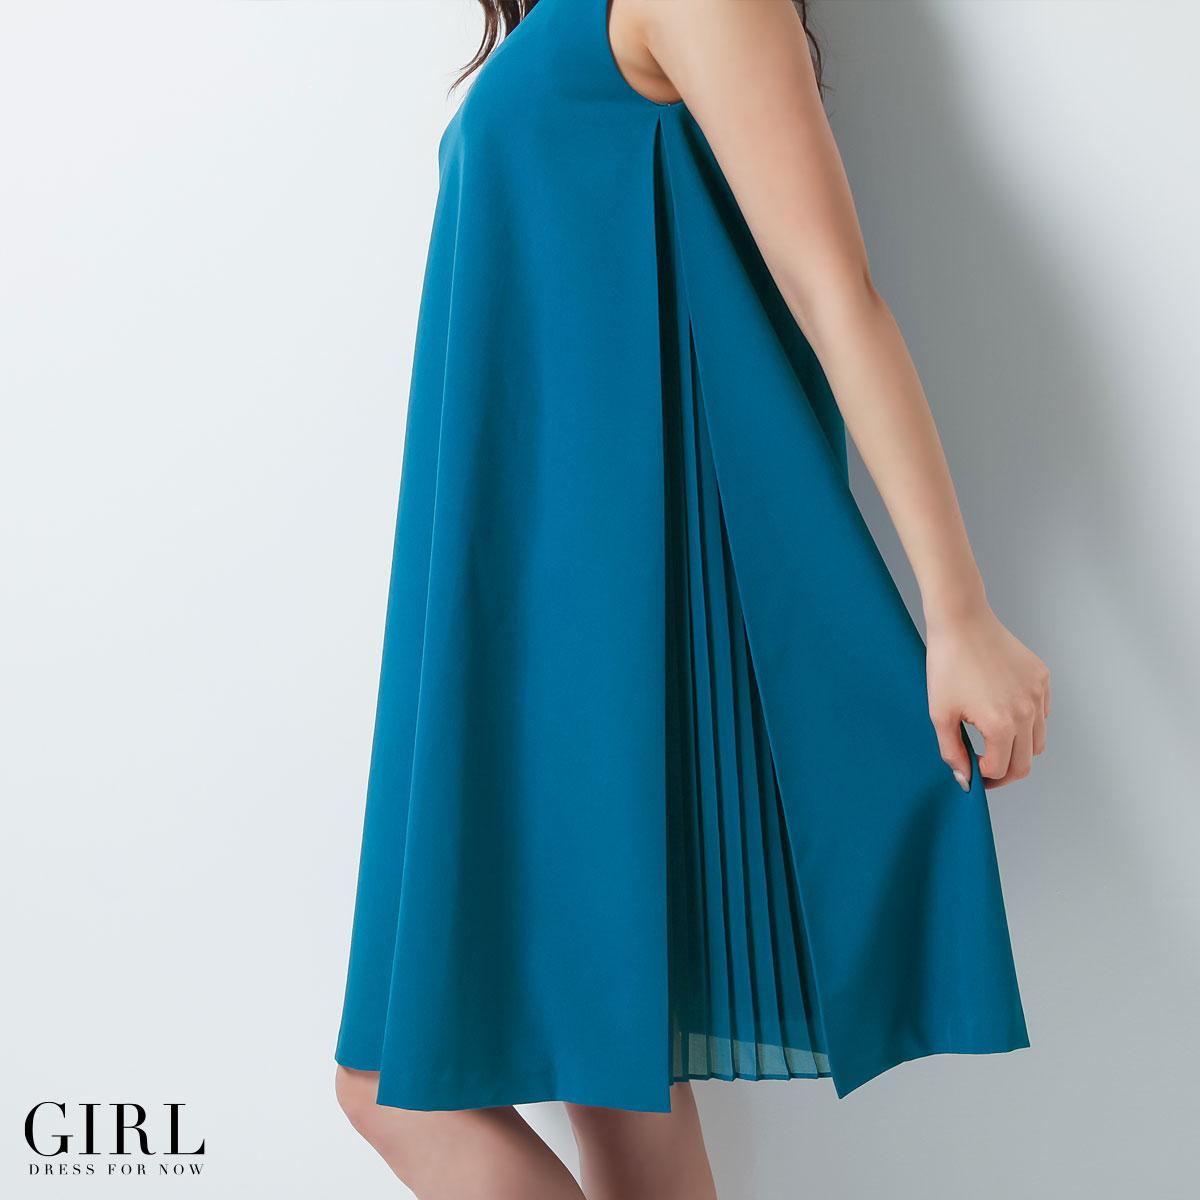 Dress shop GIRL | Rakuten Global Market: Turtleneck dress medium ...